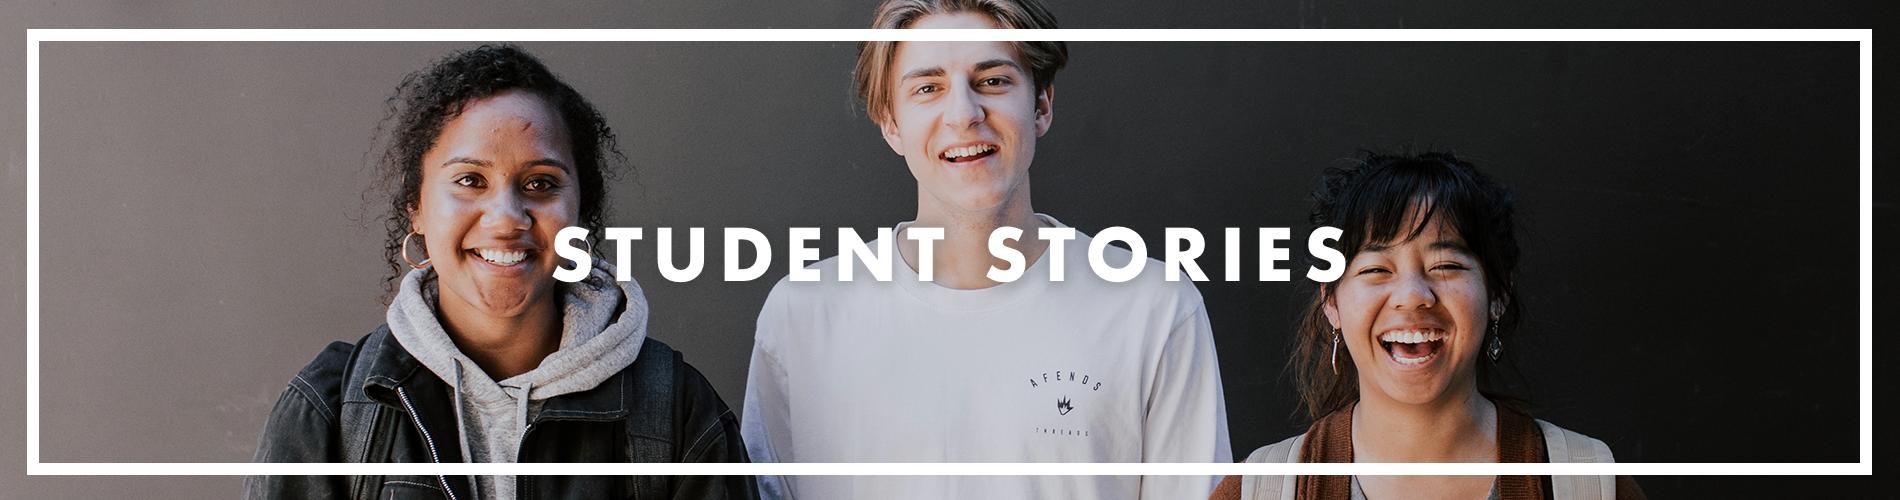 Student Stories Header